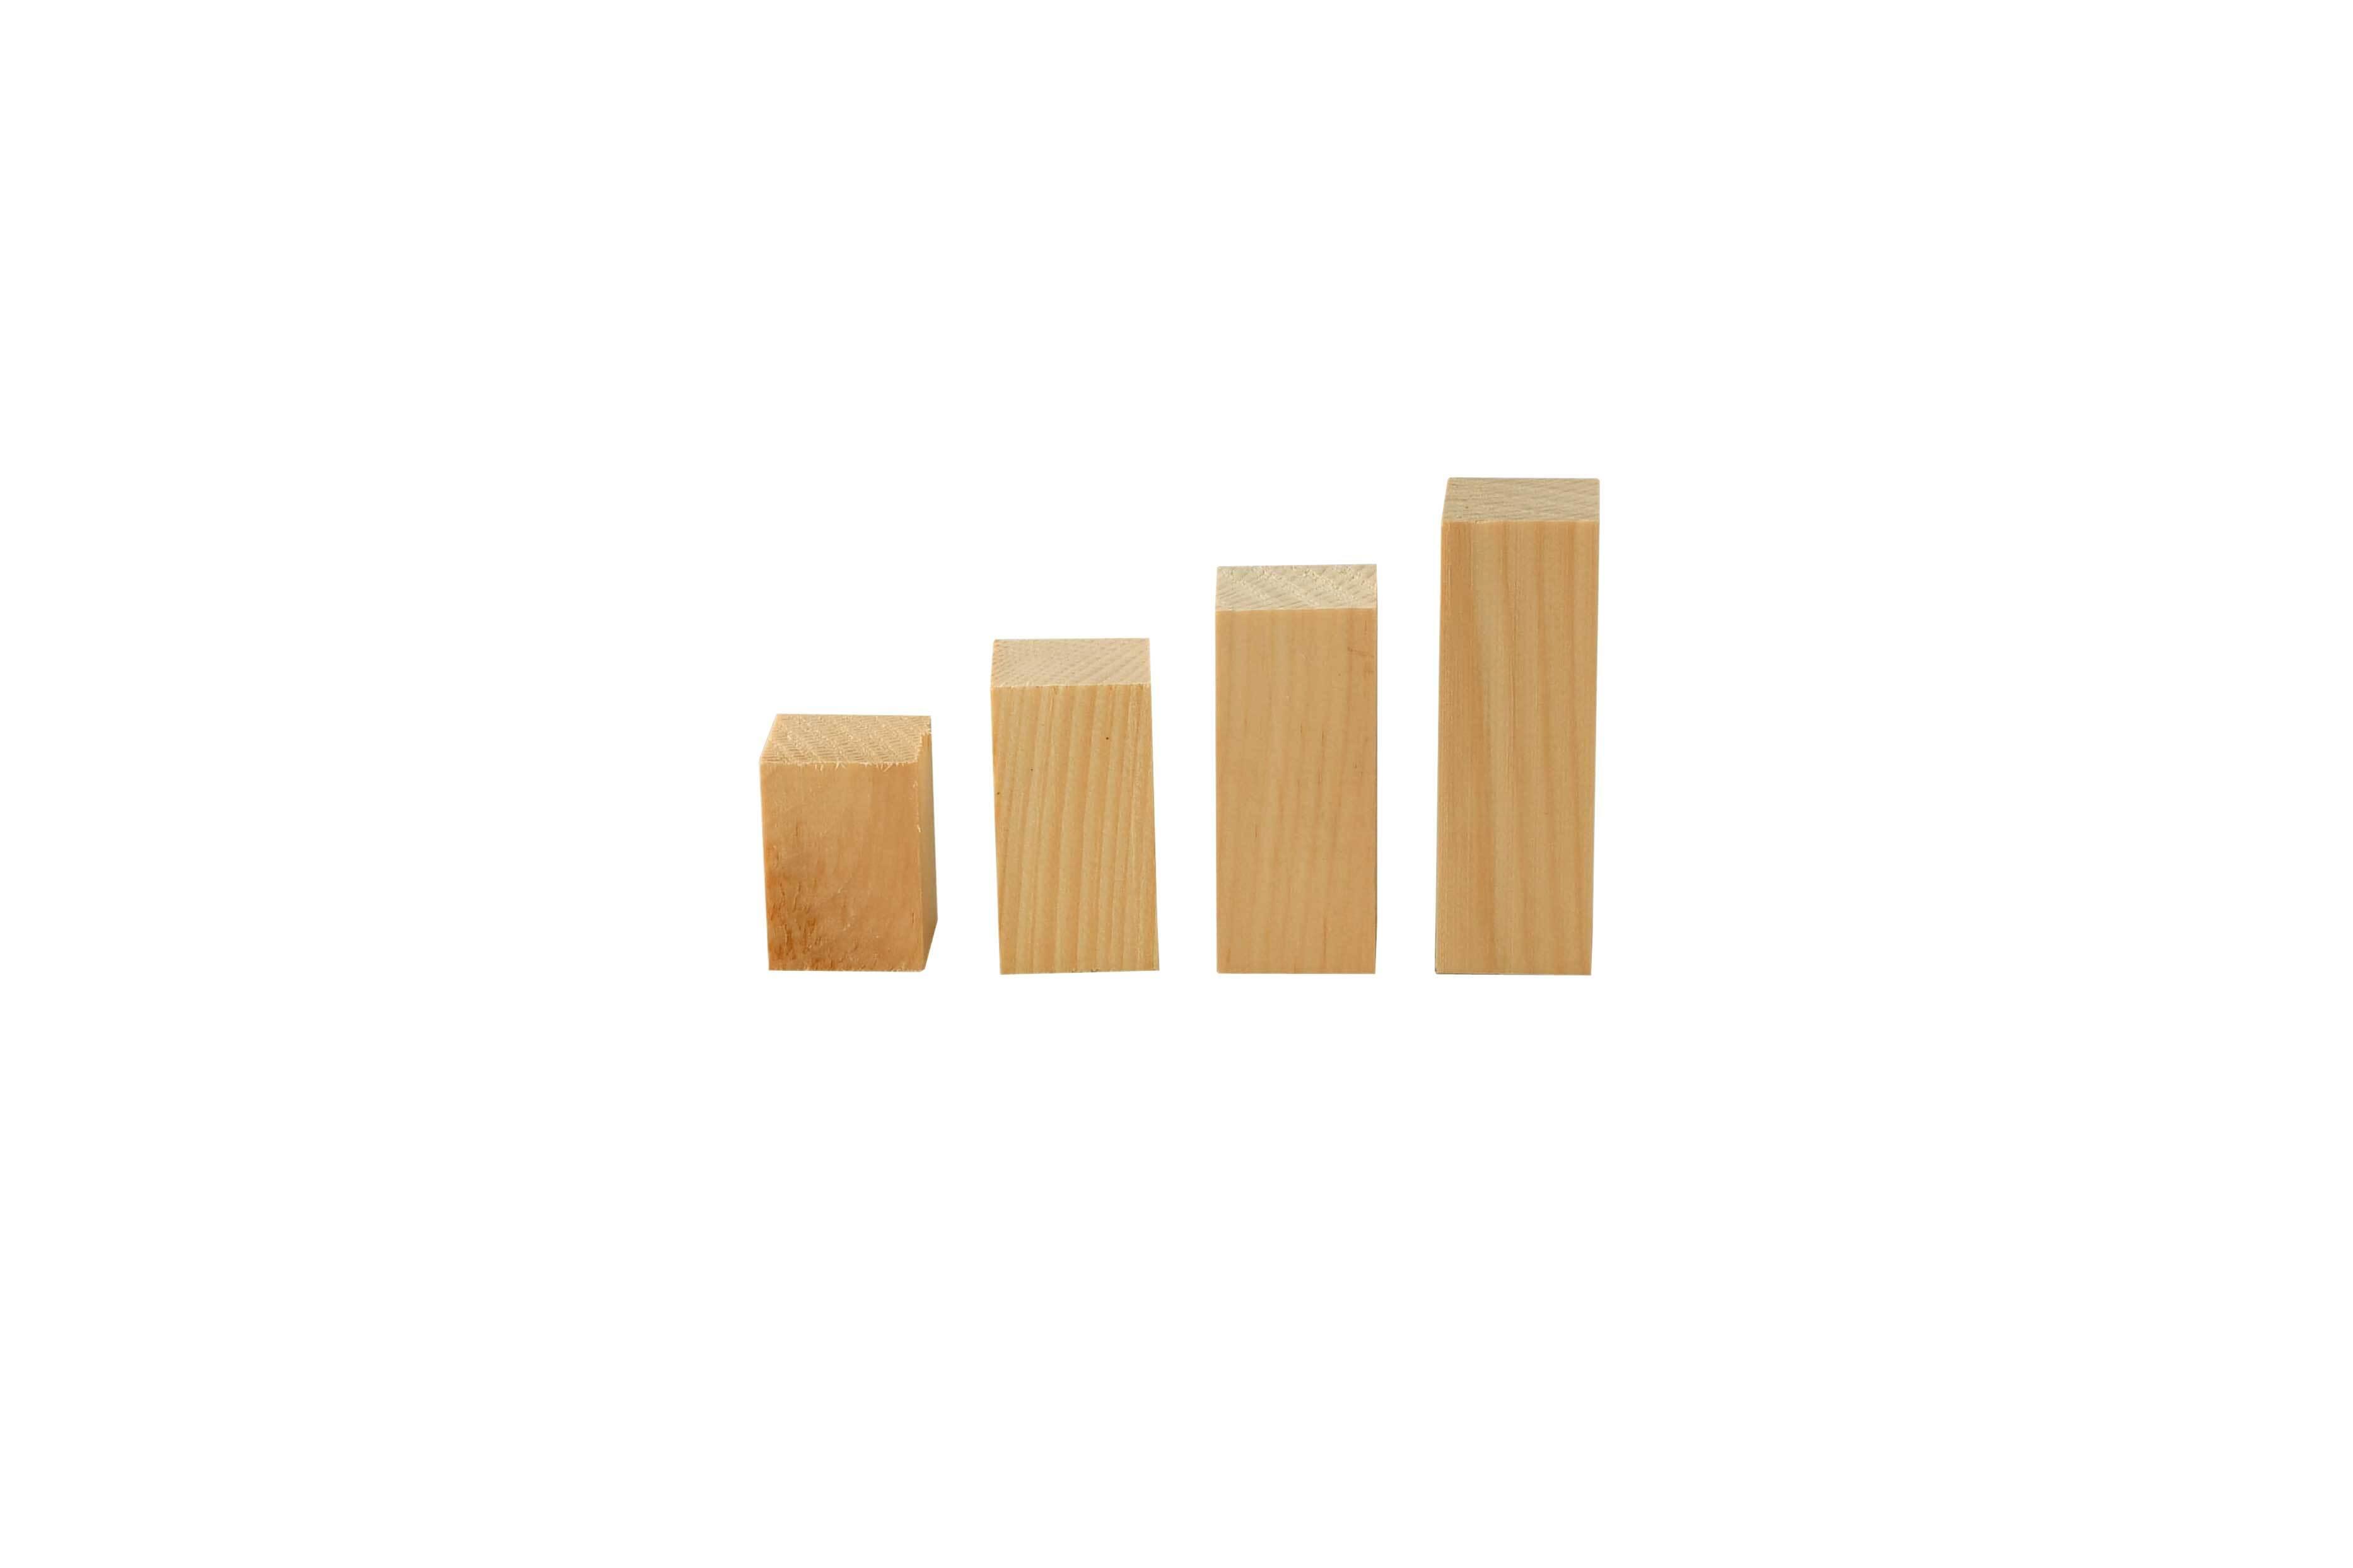 Blocs de construction en pin Cembro -0,5 kg, 2x2cm